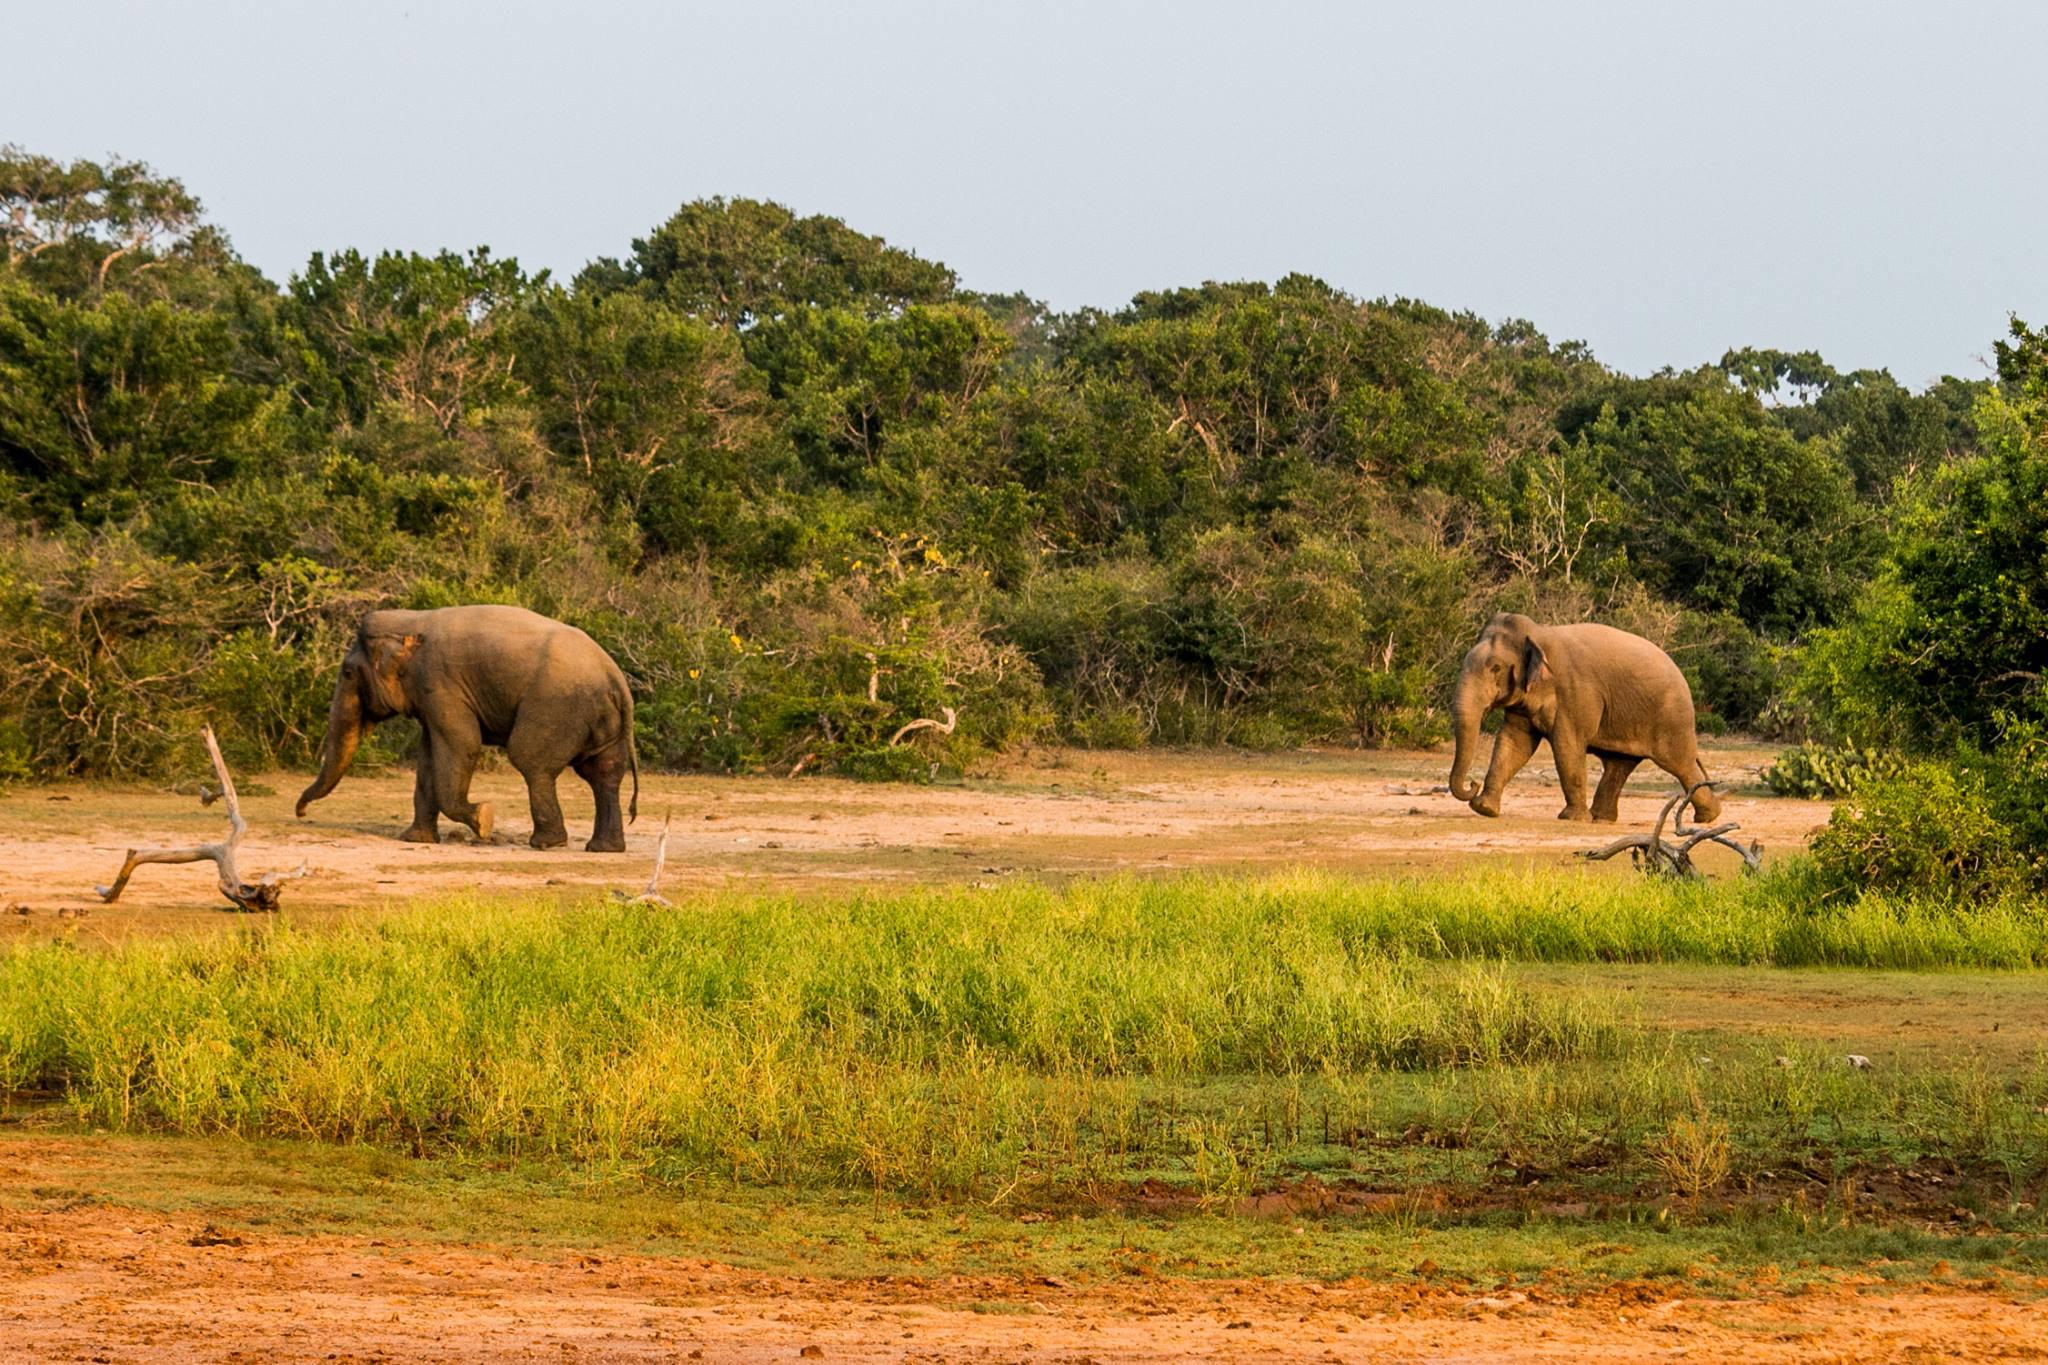 invite-to-paradise-sri-lanka-and-maldives-specialists-travel-agent-tour-operator-customer-review-feedback-joel-rhian-elephant-safari.jpg